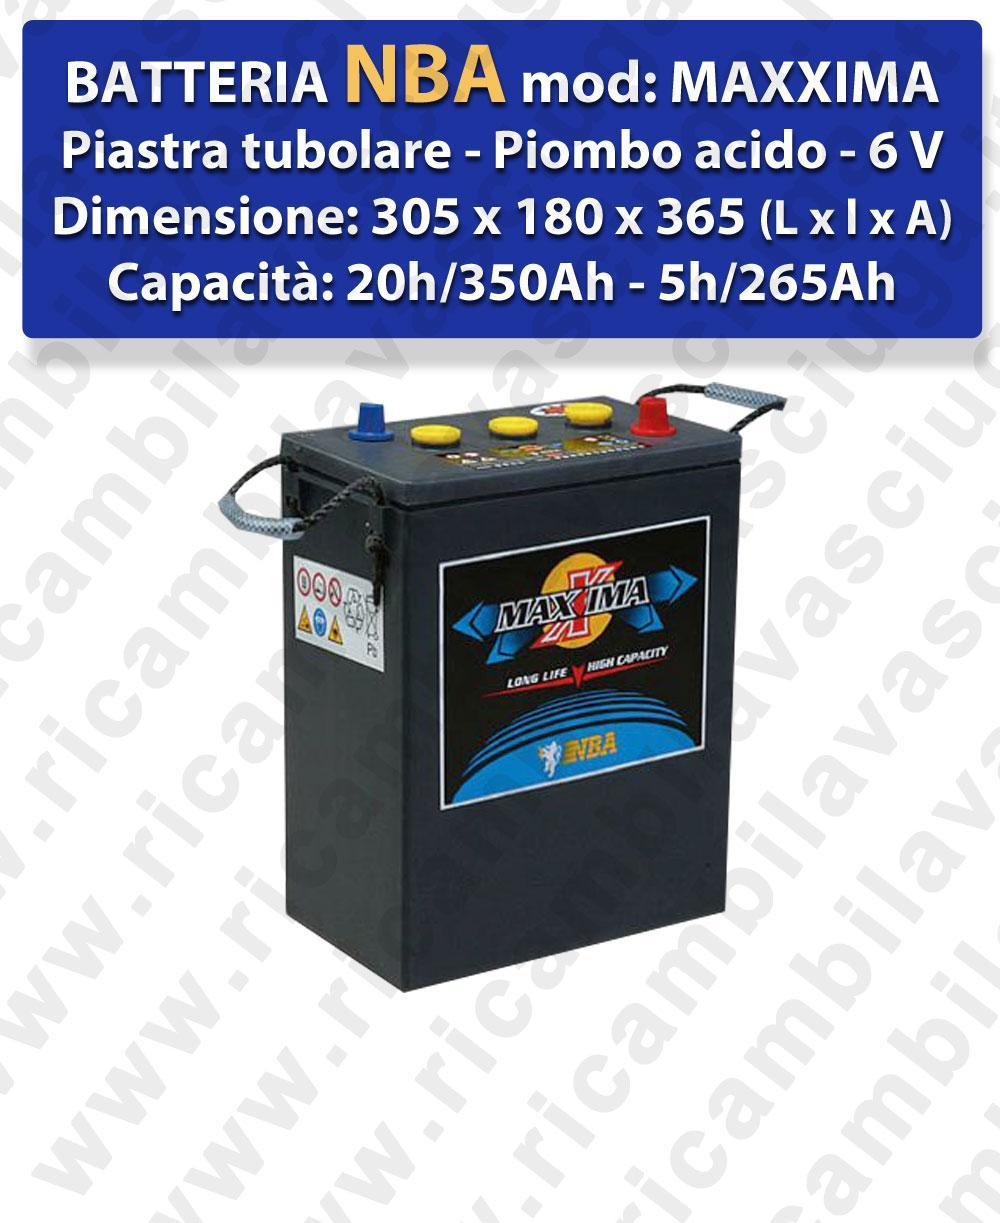 MAXXIMA Batteria piombo - NBA 6V 350Ah 20/h